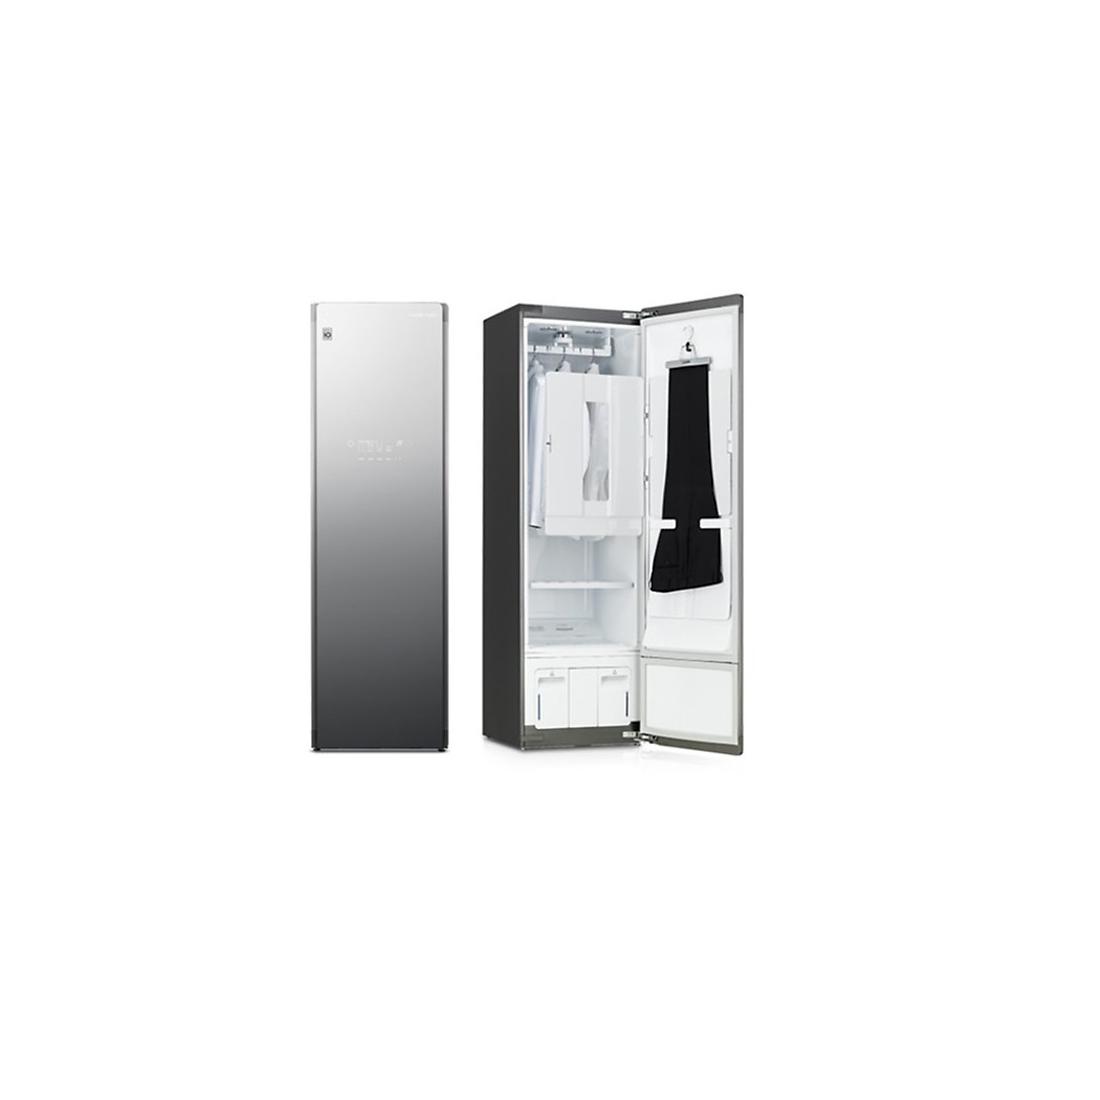 Máy giặt hấp sấy LG Styler S5MB- thegioidogiadung.com.vn